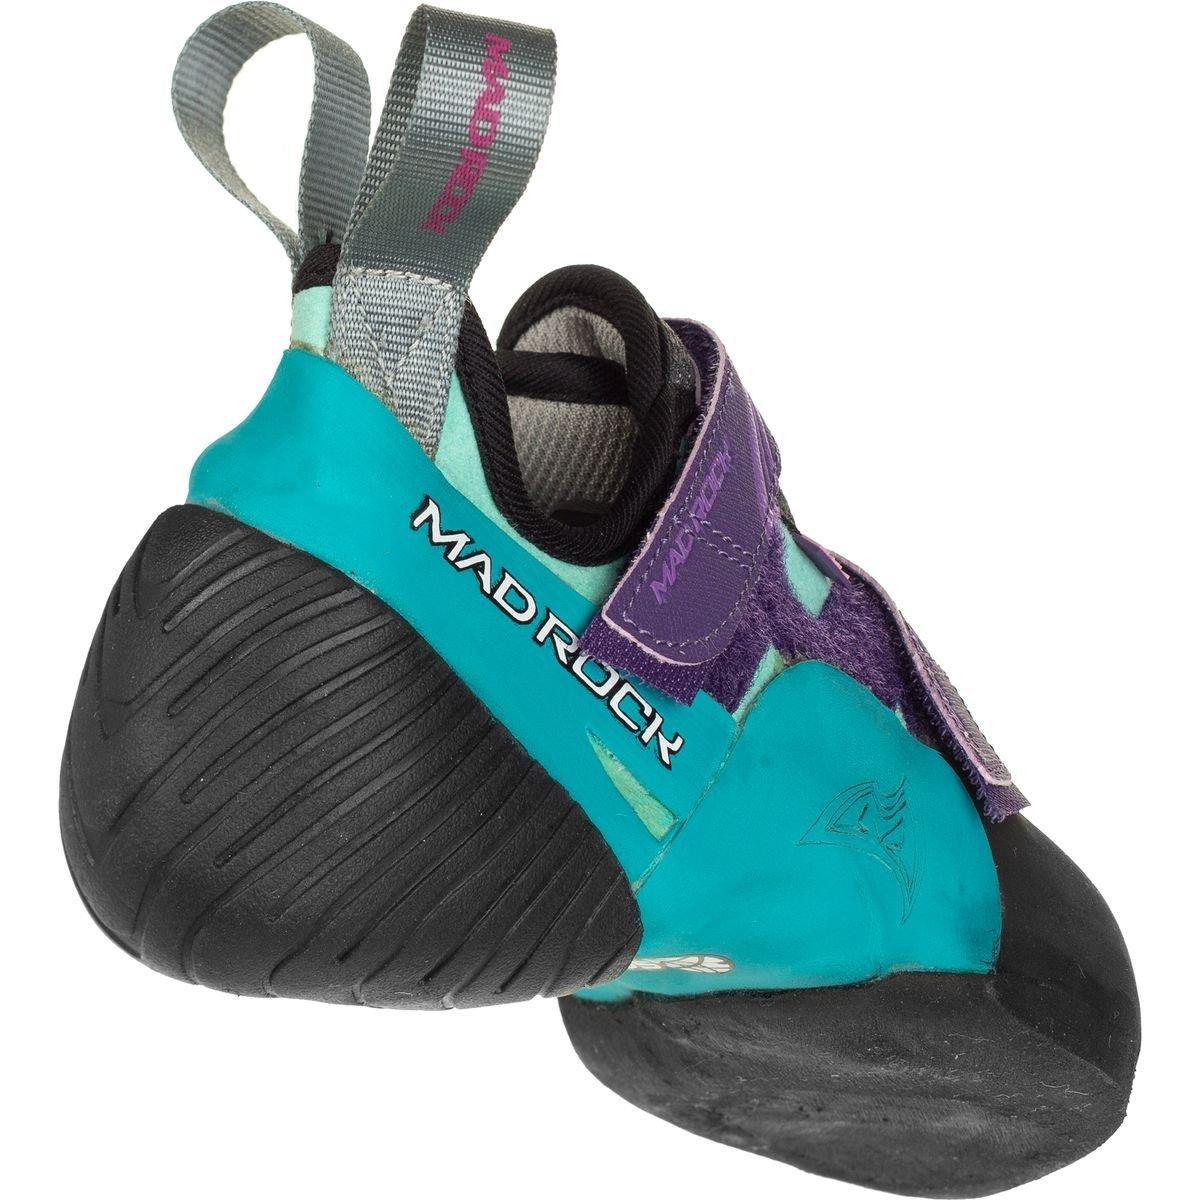 Mad Rock Lyra Climbing Shoes - Women's B00L8BWLU2 9 B(M) US|Black/Purple/Turquiose